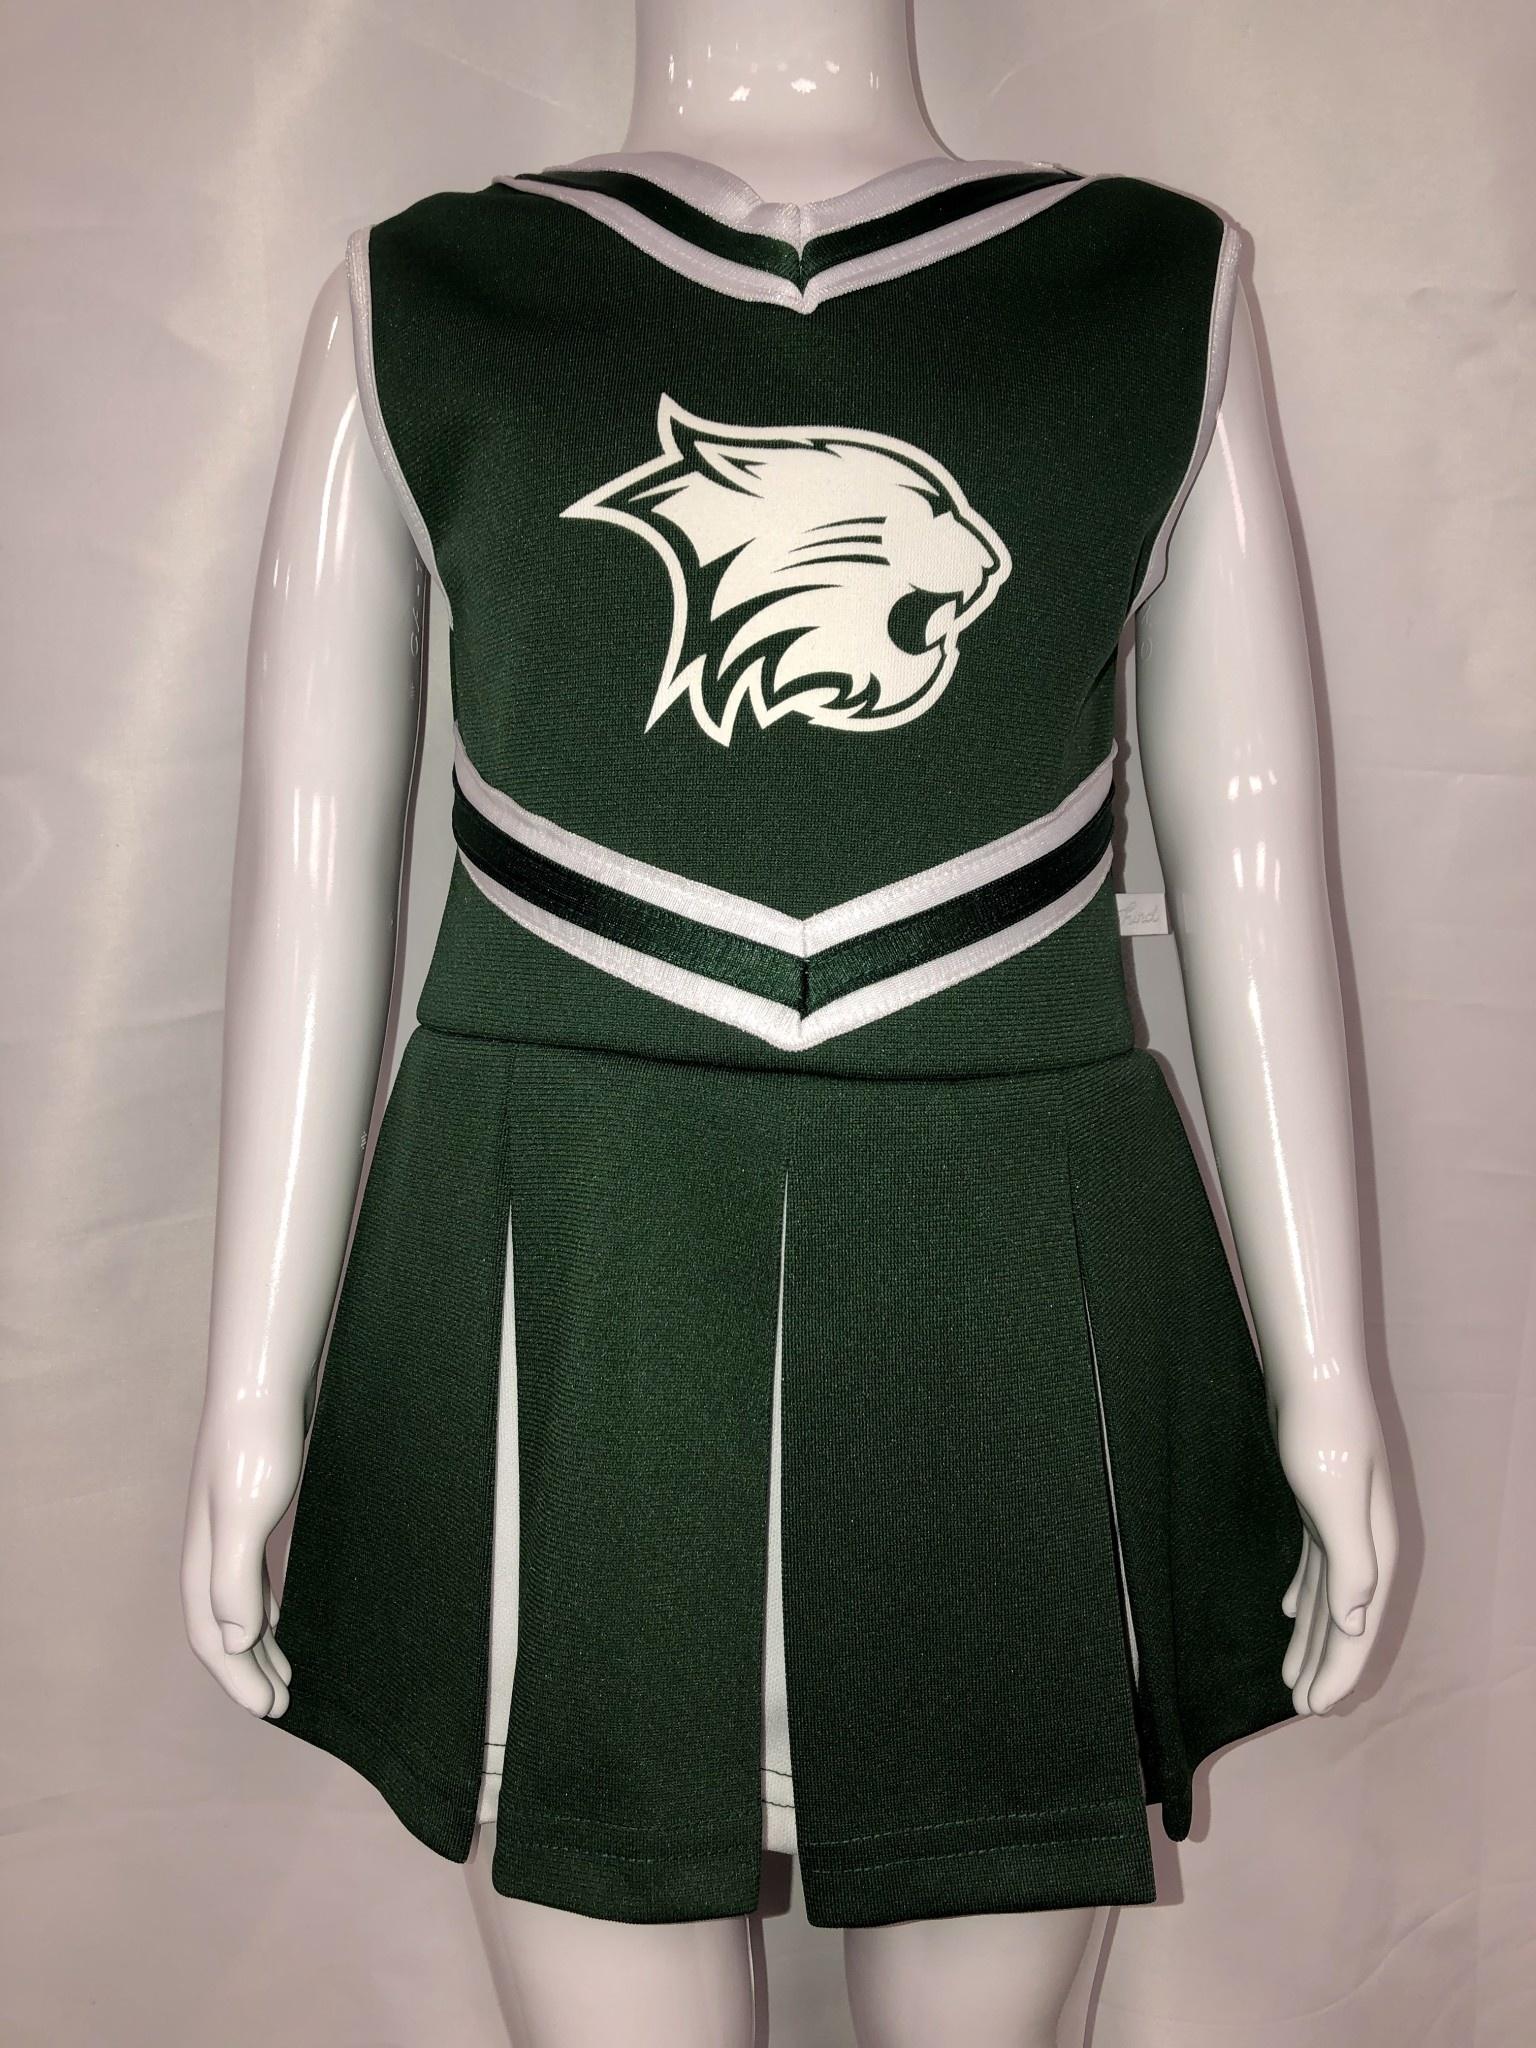 Third Street Sportswear Cheerleading Dress w/ wildcat head & Bloomer panty